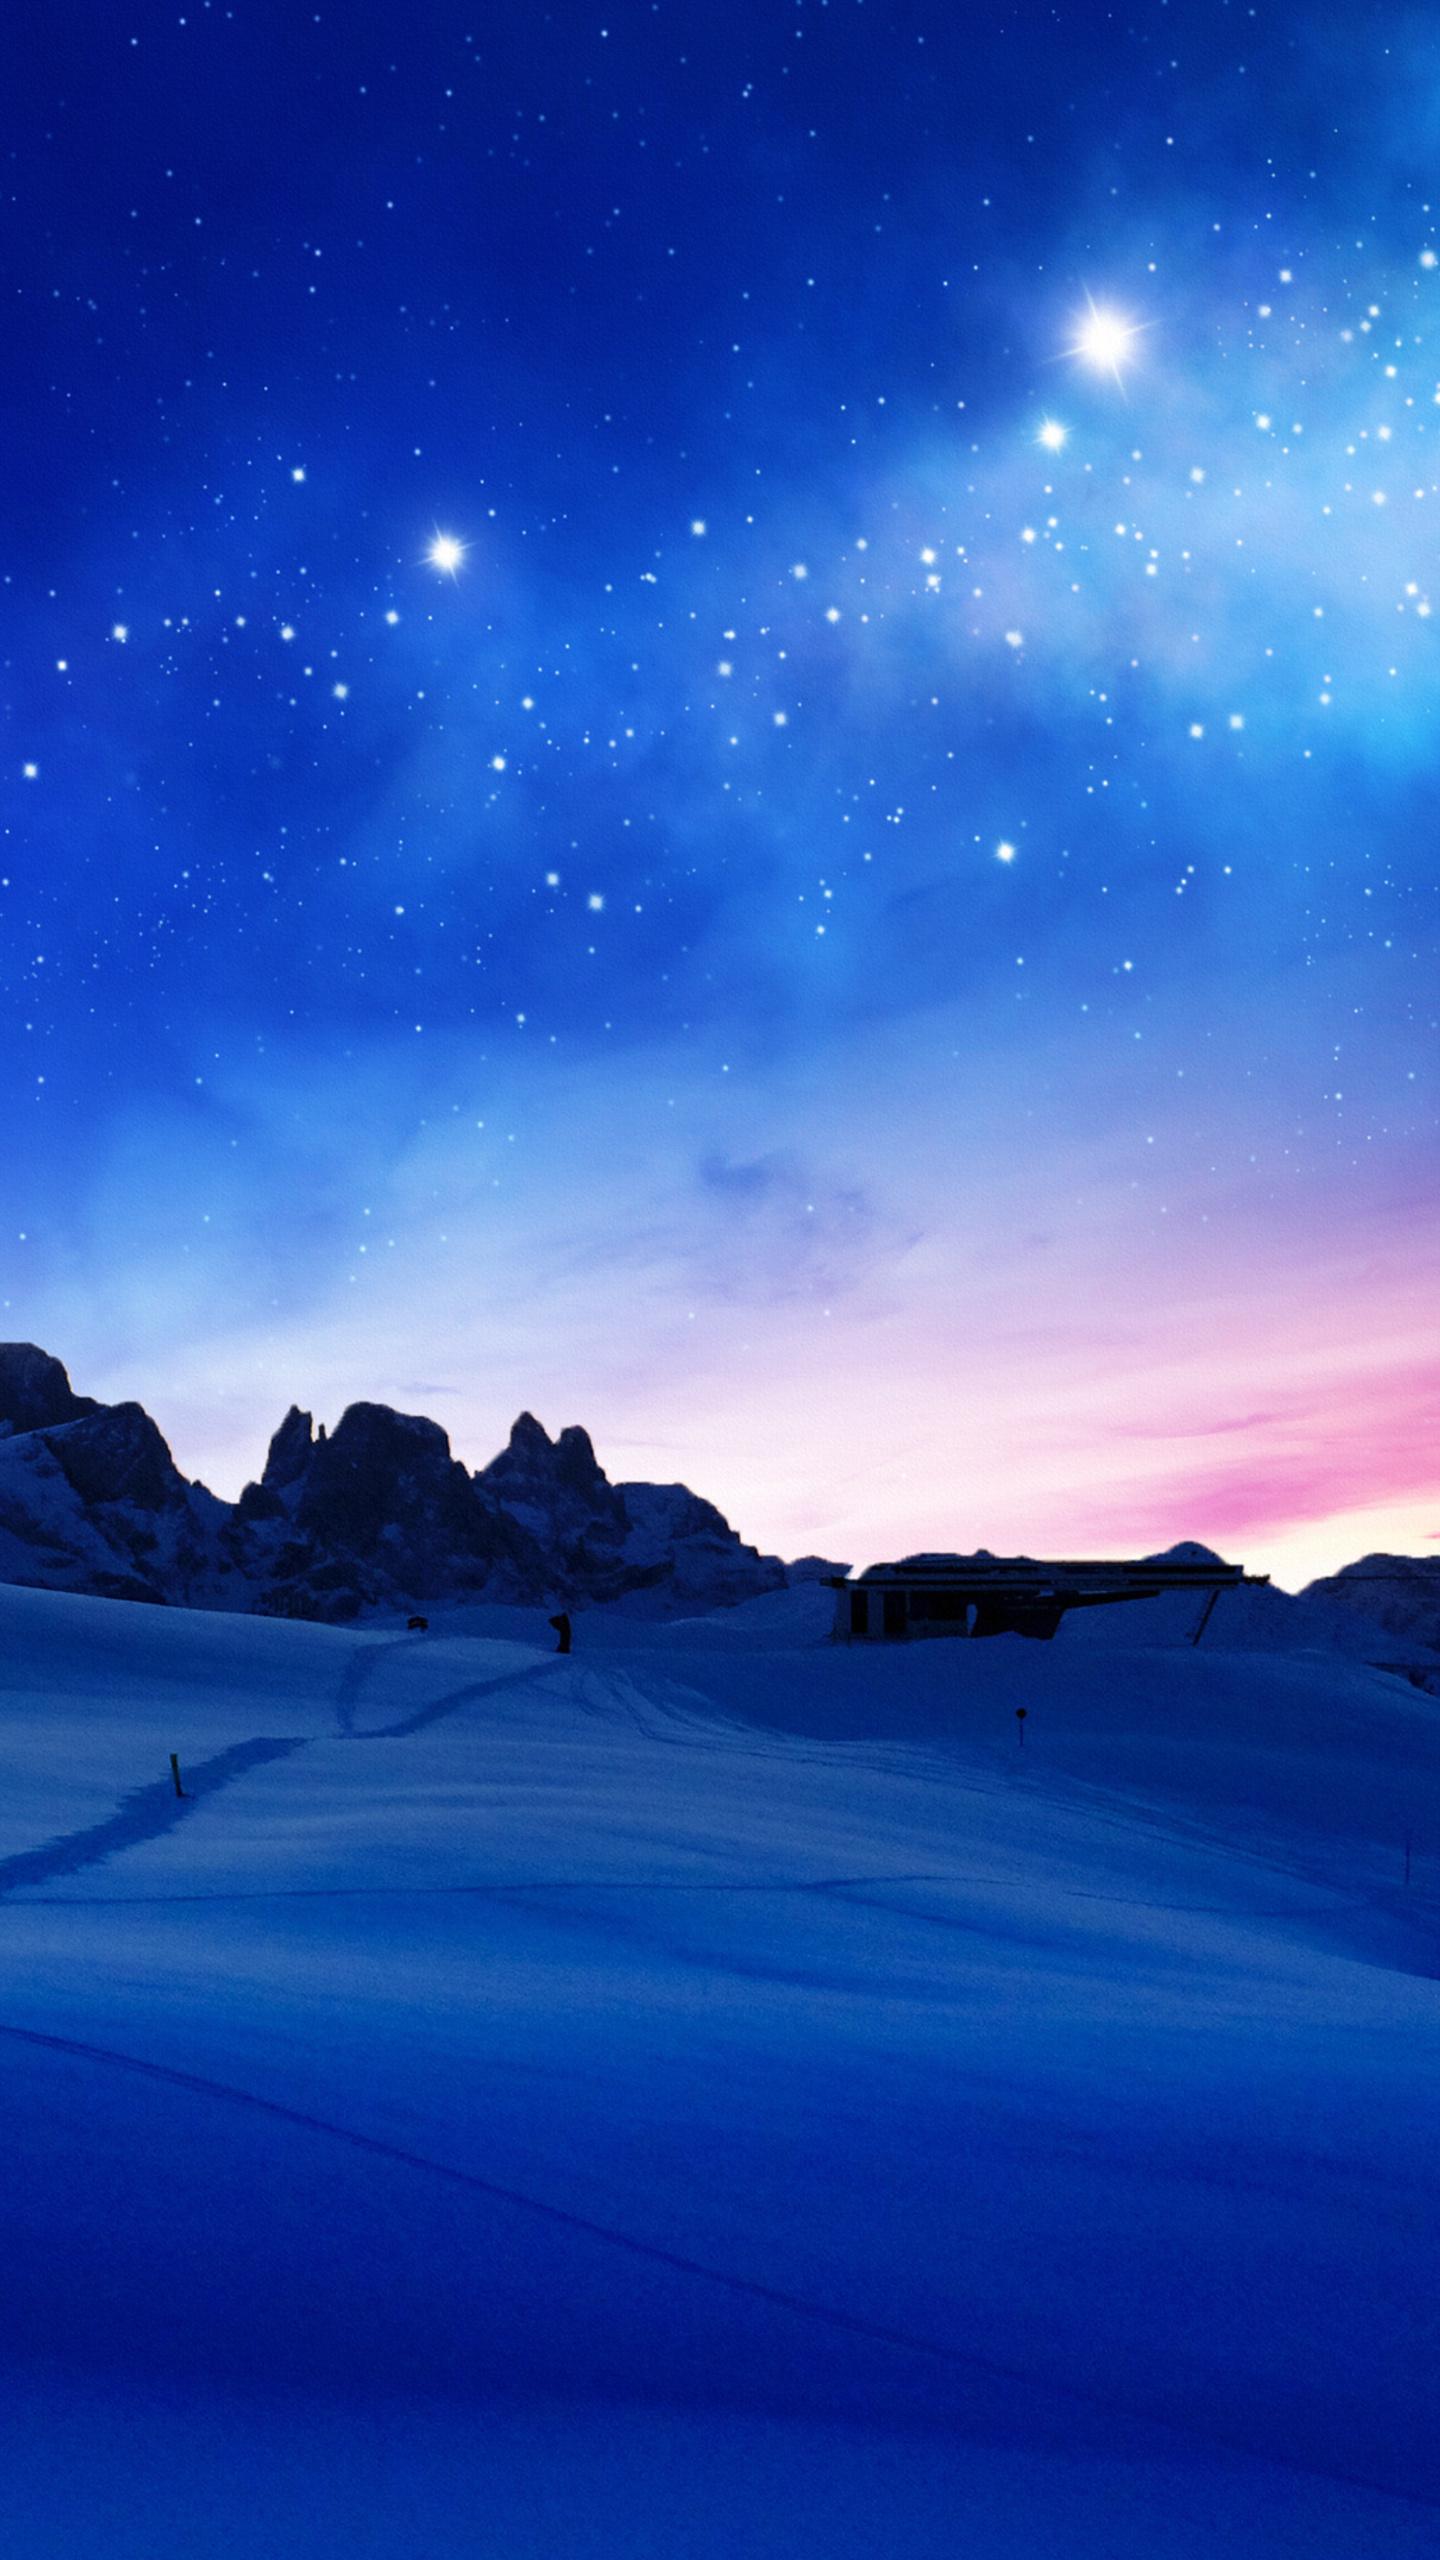 blue-cool-sunset-w4.jpg